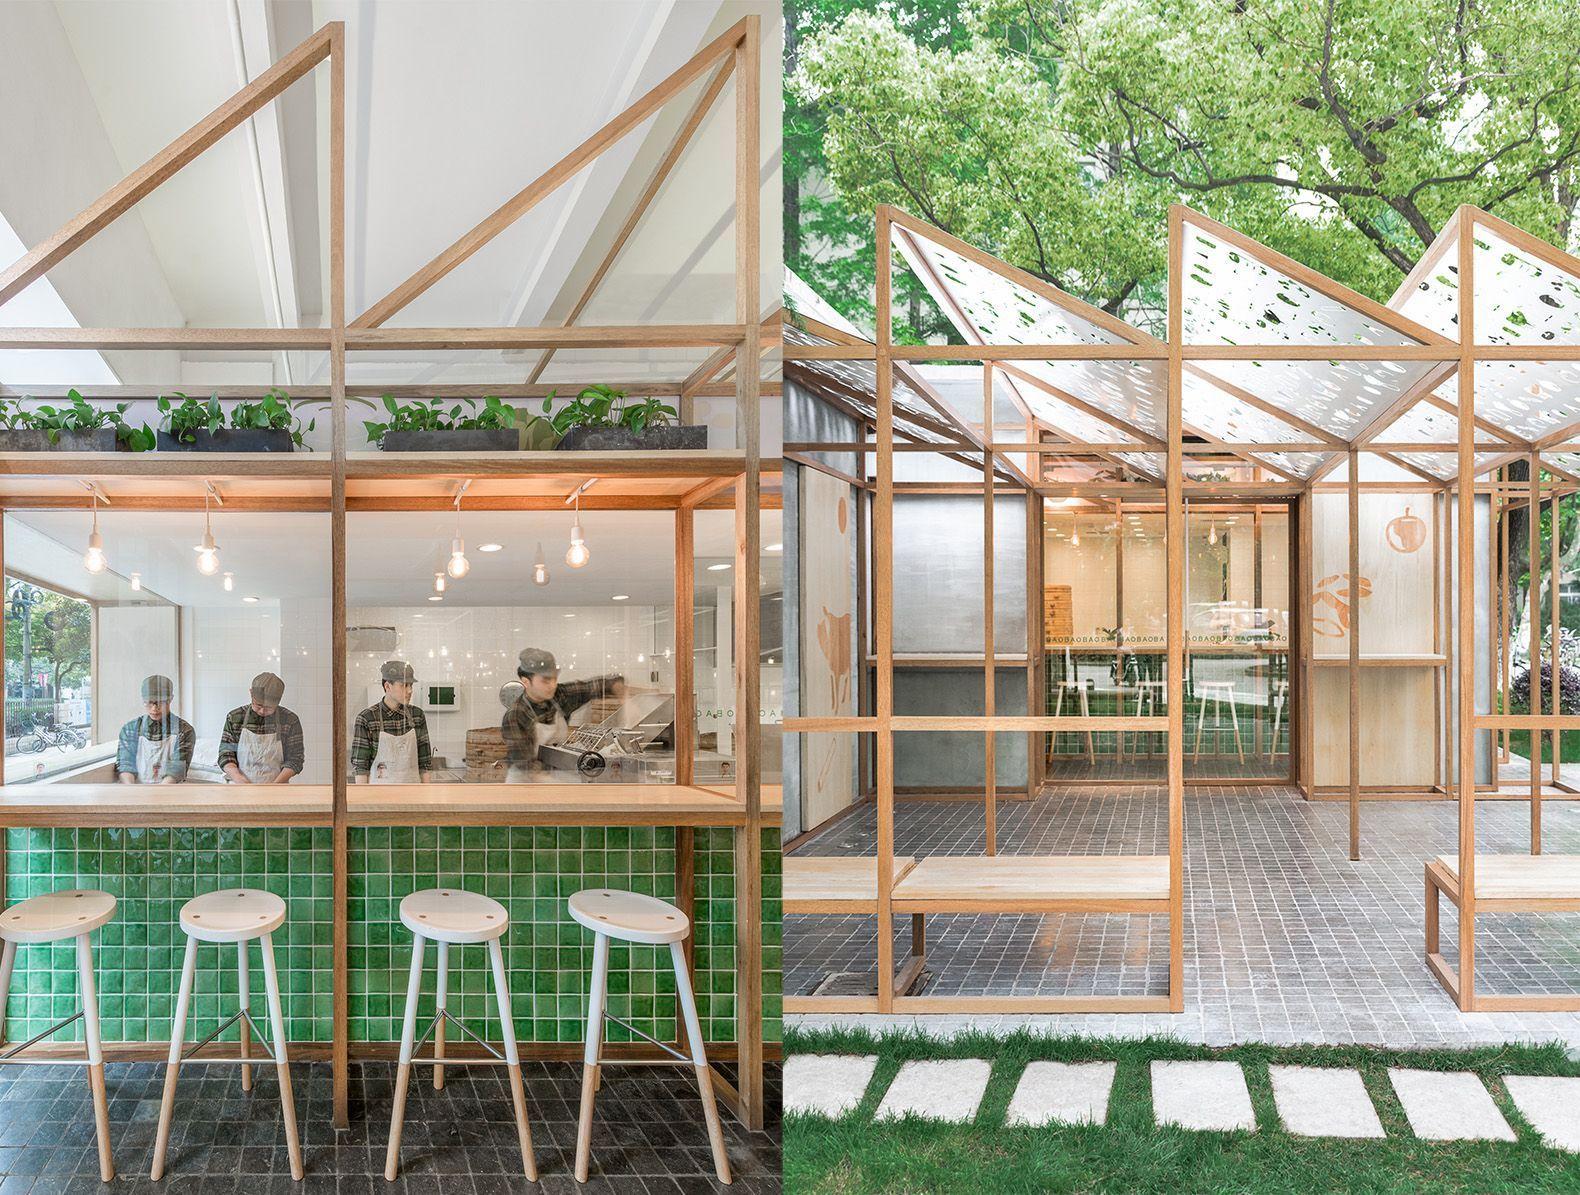 Architecture Restaurant Interior Design Natural Light Greenhouse